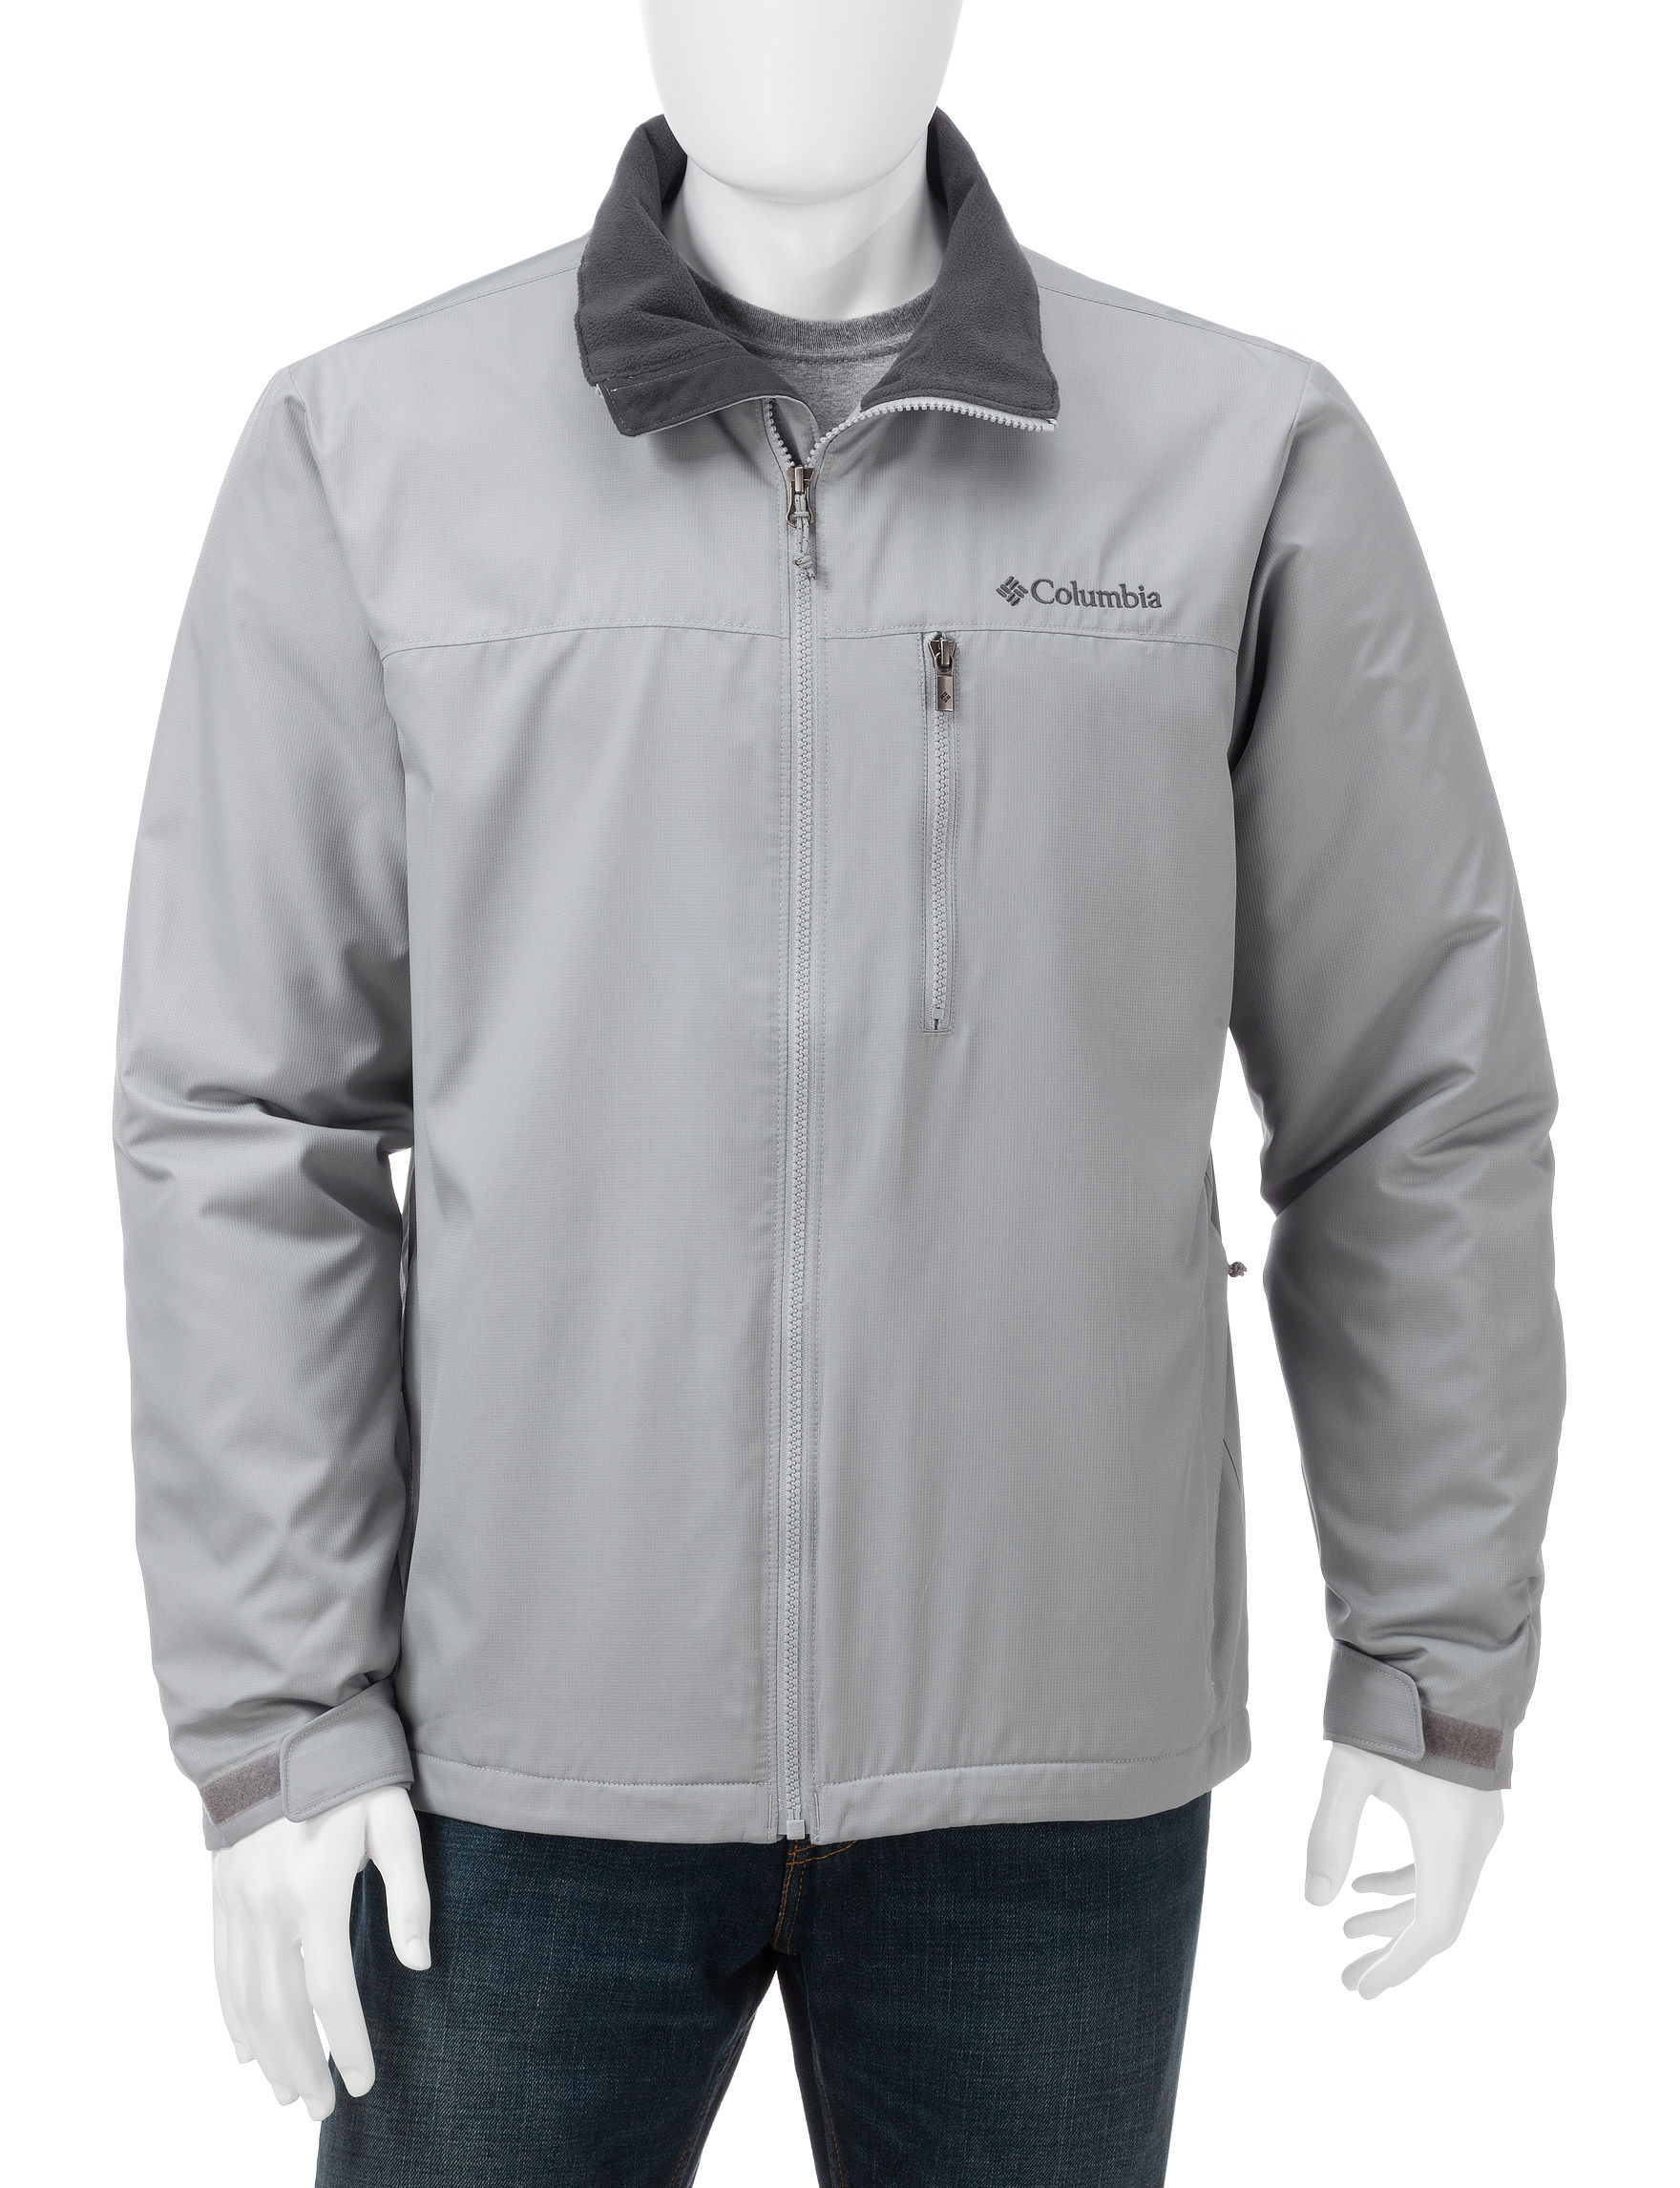 Columbia Medium Grey Insulated Jackets